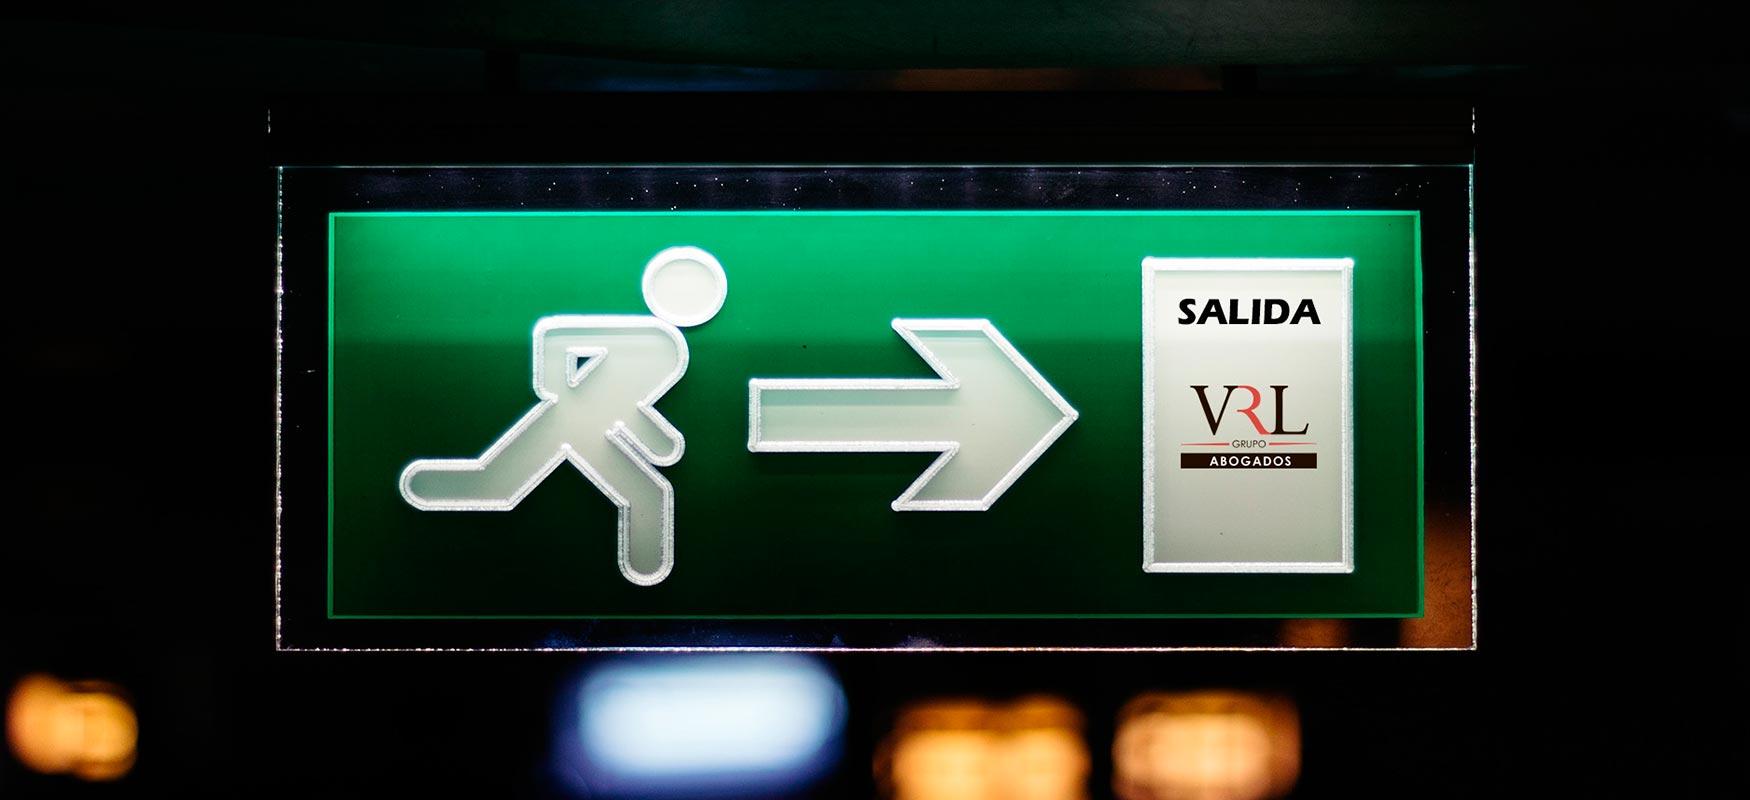 VRL-Aggados---Salir-de-las-Tarjetas-Revolving